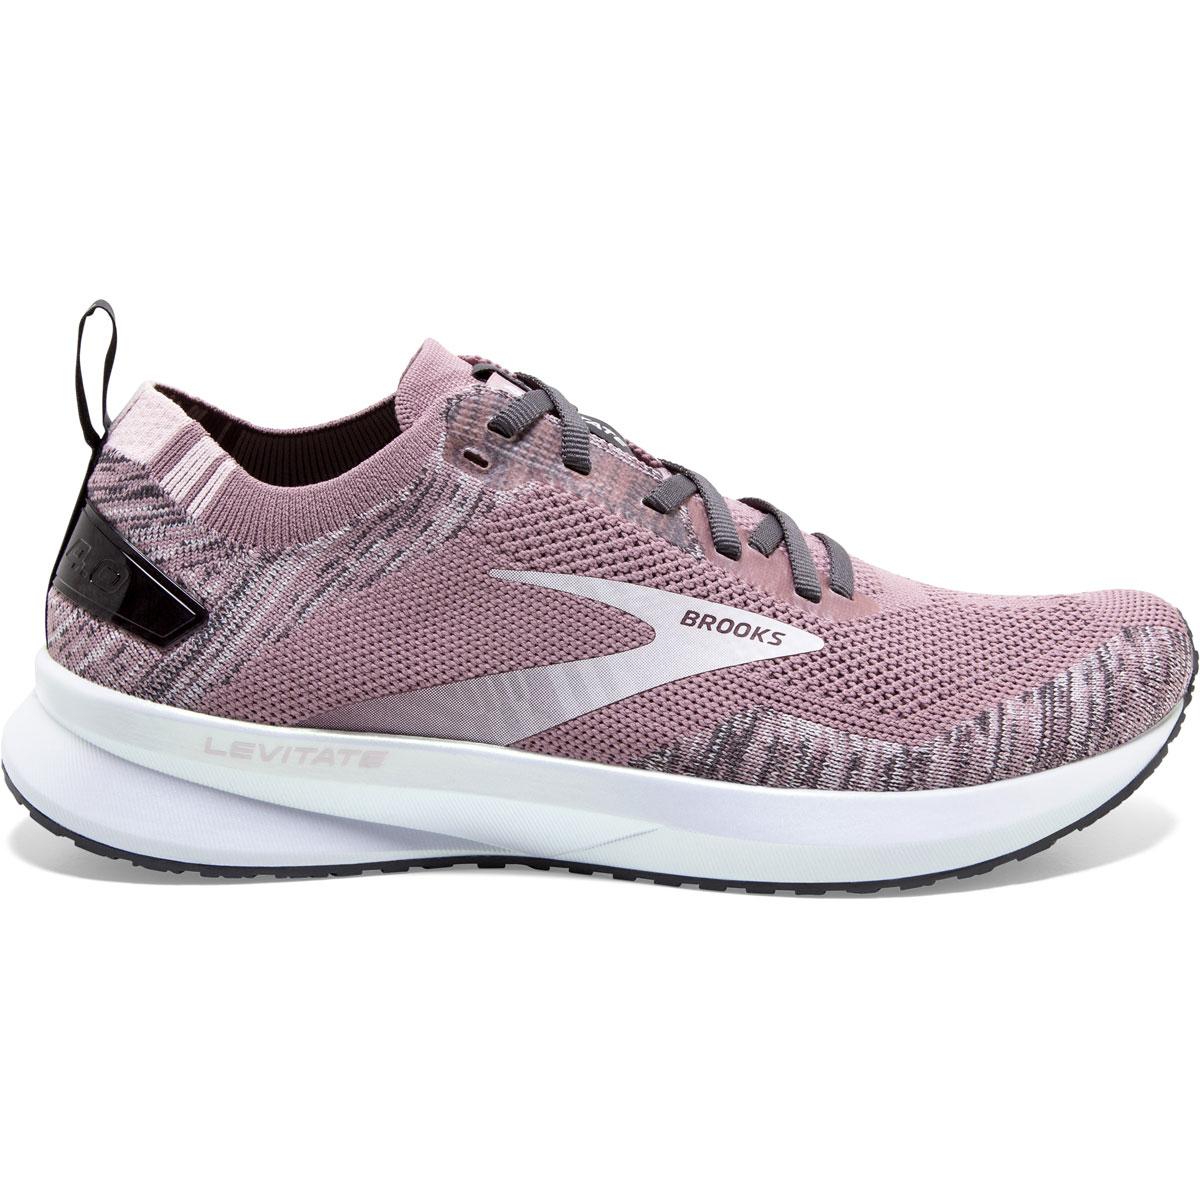 Women's Brooks Levitate 4 Running Shoe - Color: Blackened Pearl - Size: 5.5 - Width: Regular, Blackened Pearl, large, image 1